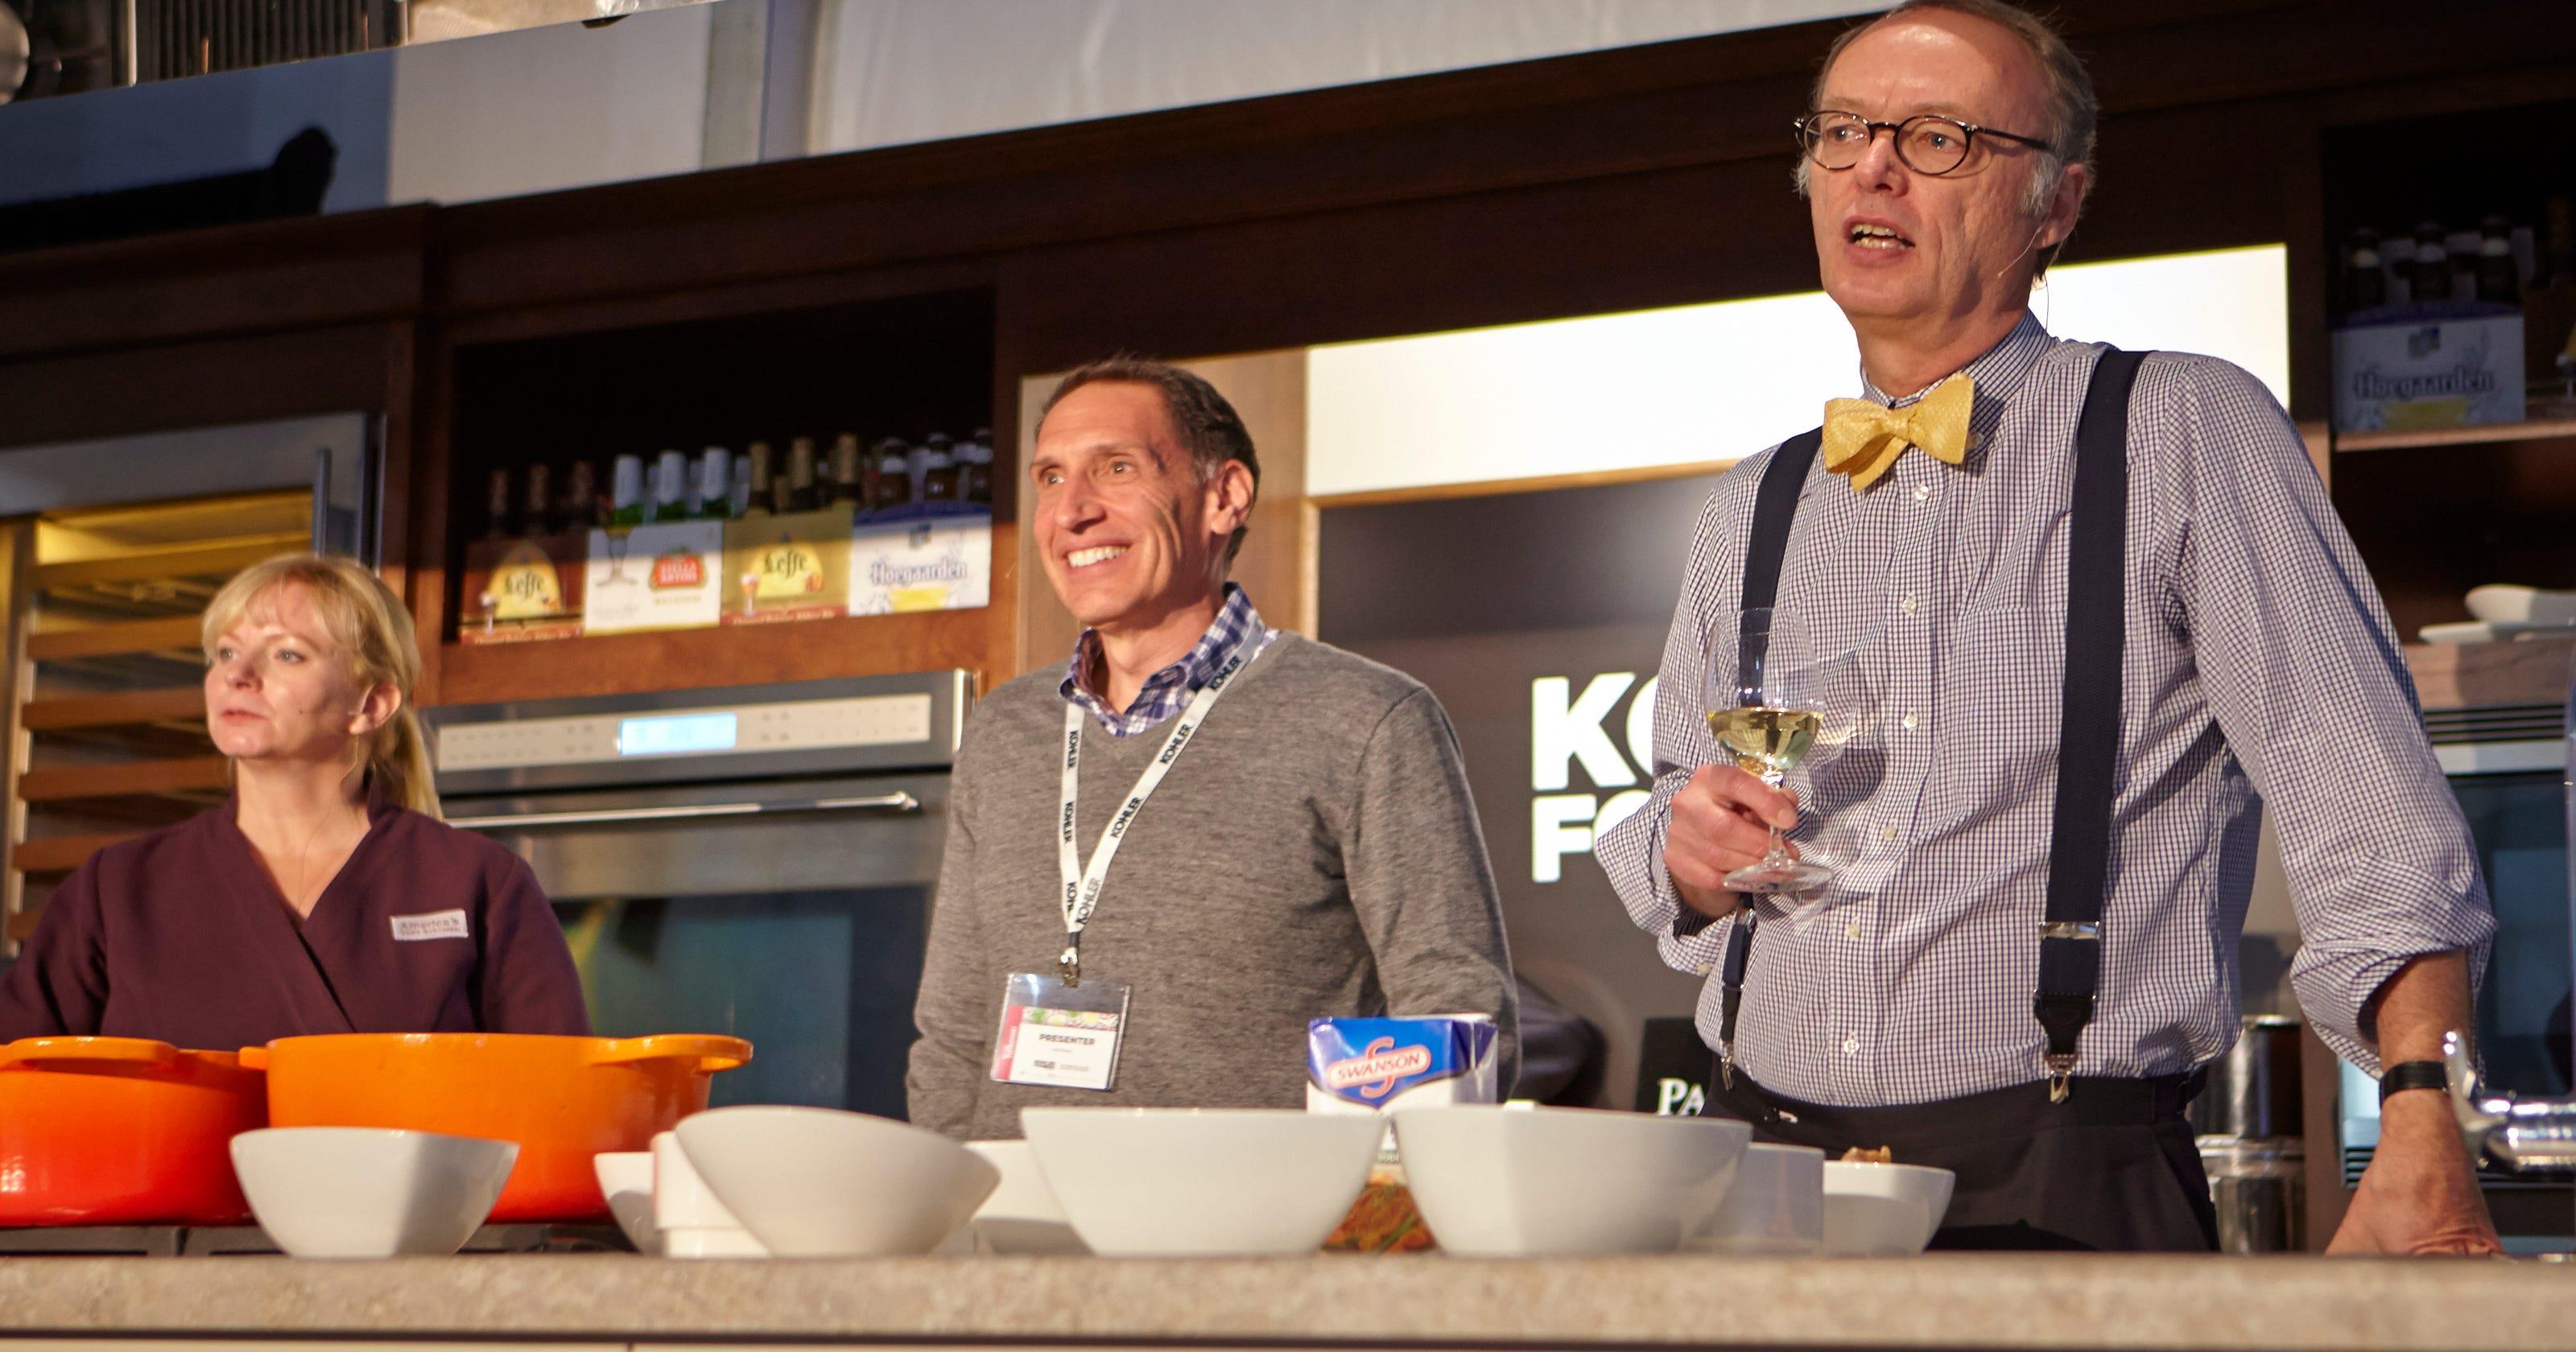 America's Test Kitchen makes local visit